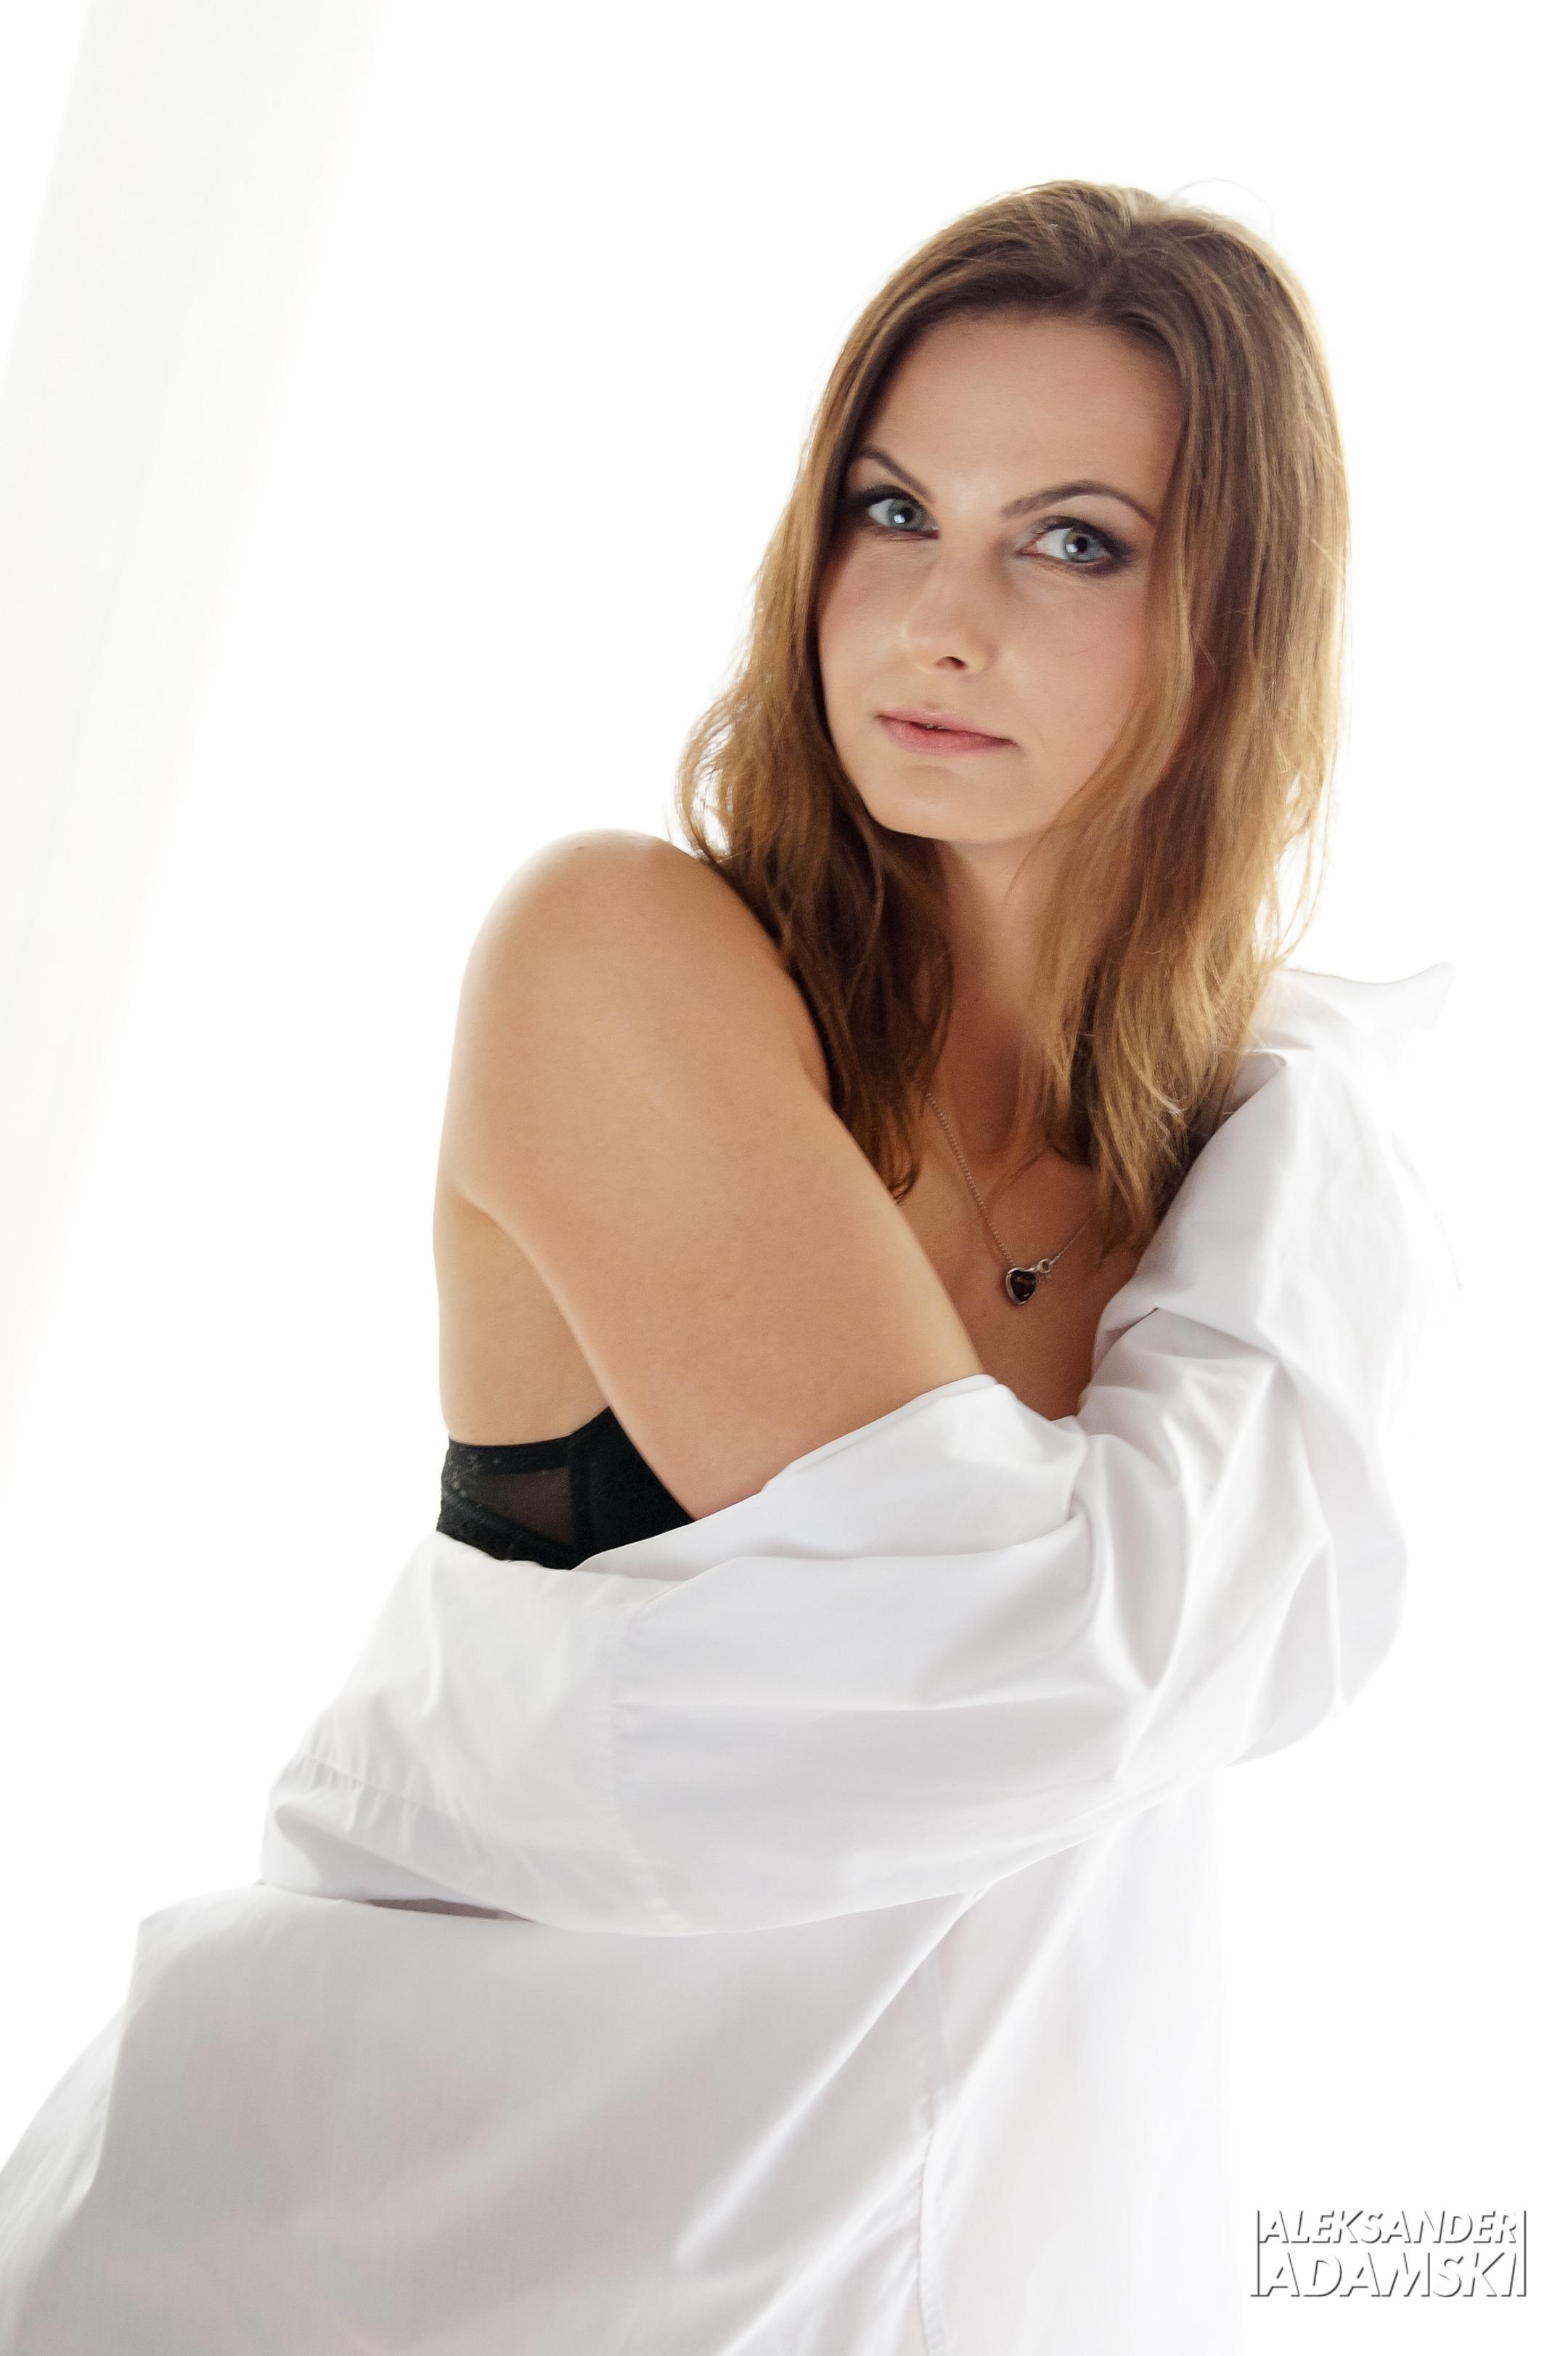 Fotografia sensualna i Dagmara